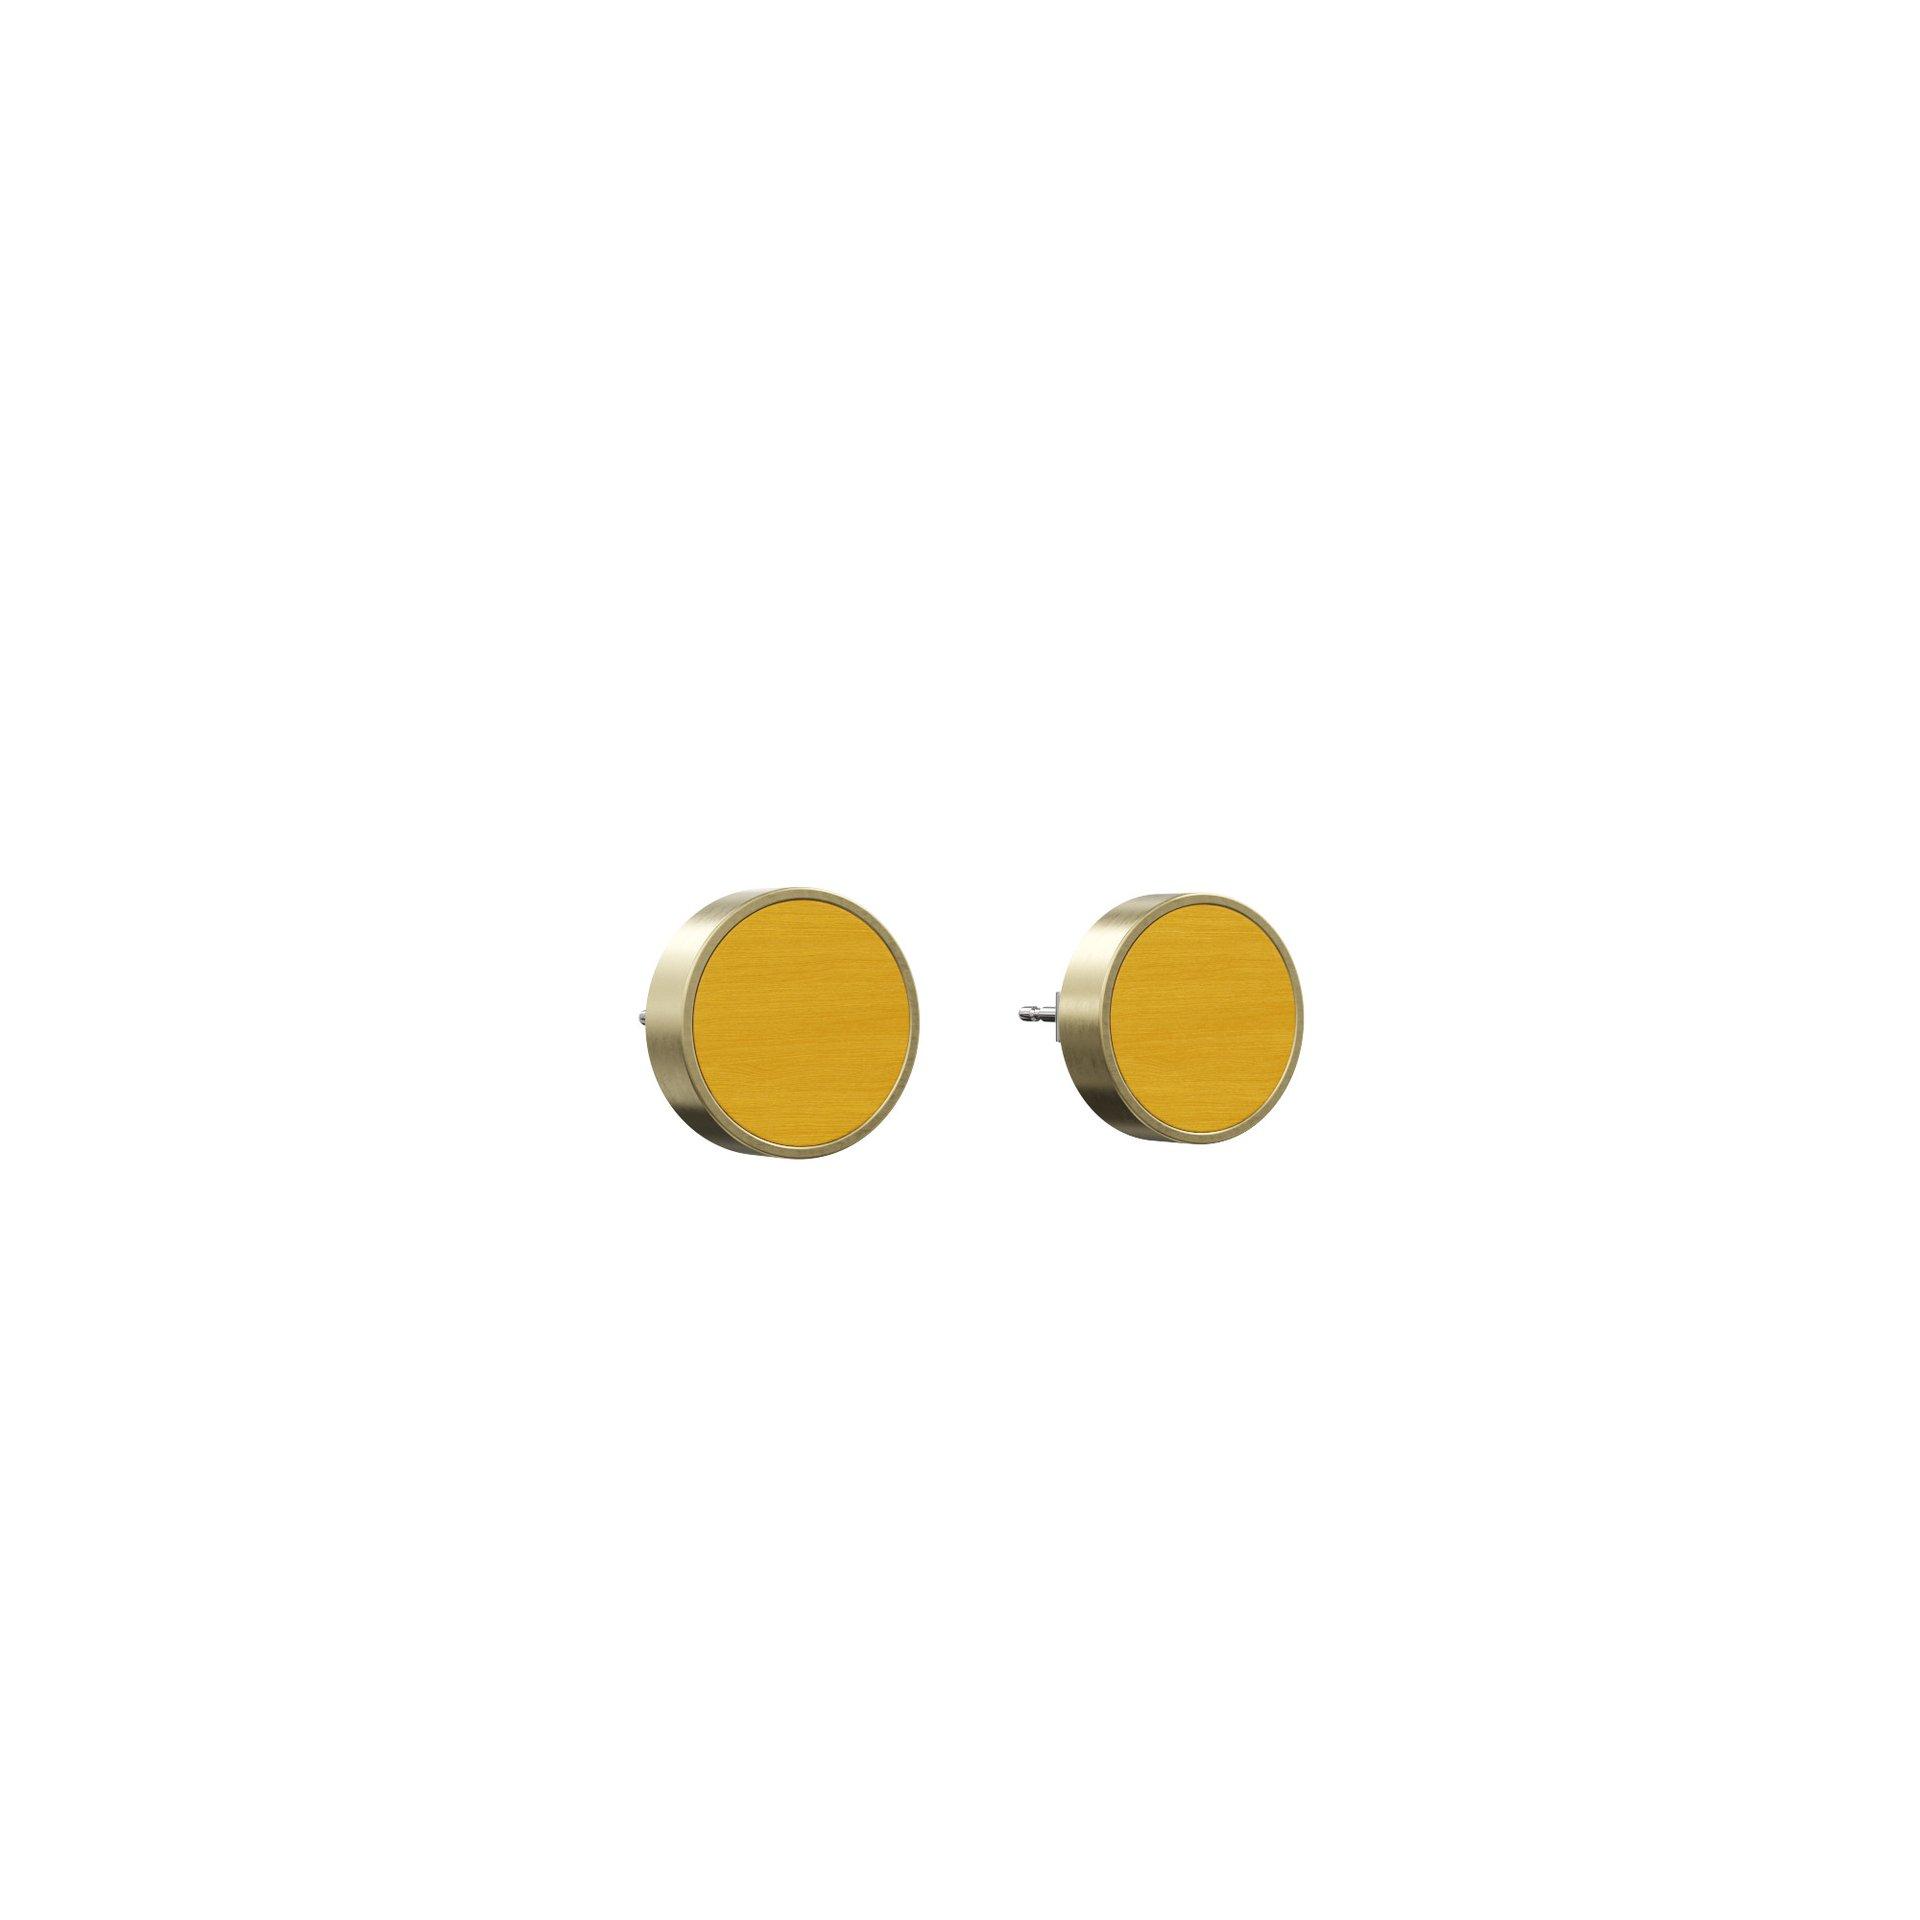 Øreringe Determinativ – Gul/Guld